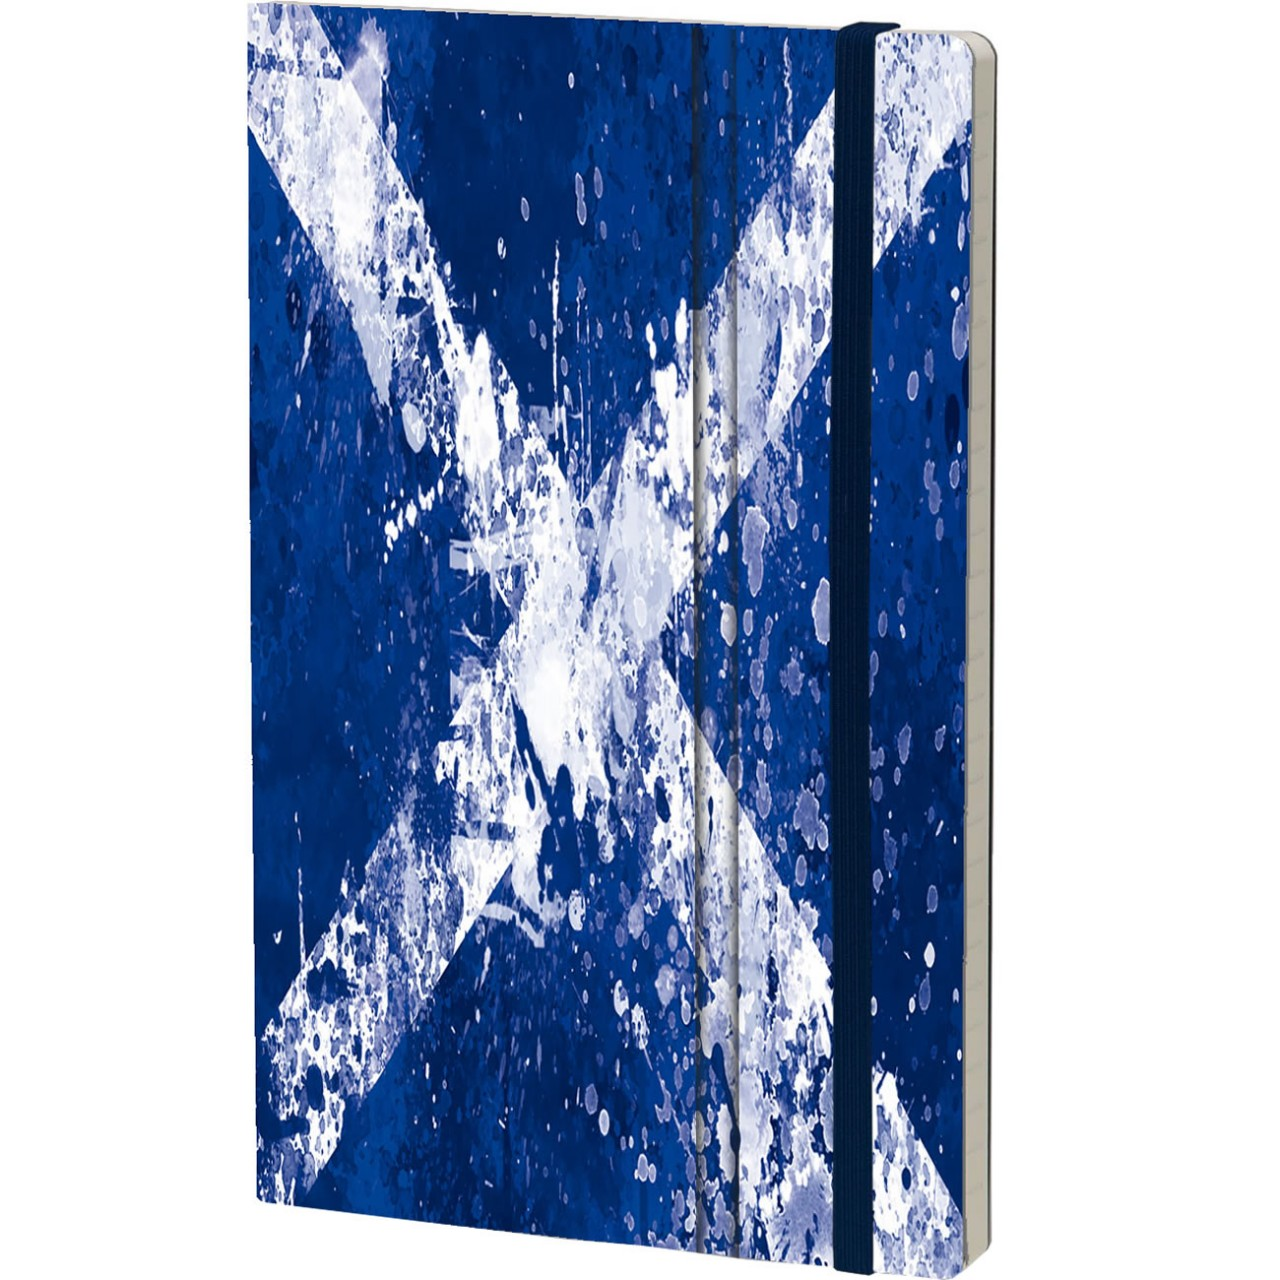 Stifflexible Notizbuch HISTORICAL NOTES 13 x 21 cm 192 S., ALBA AN ÀIGH (Scotland Flag)